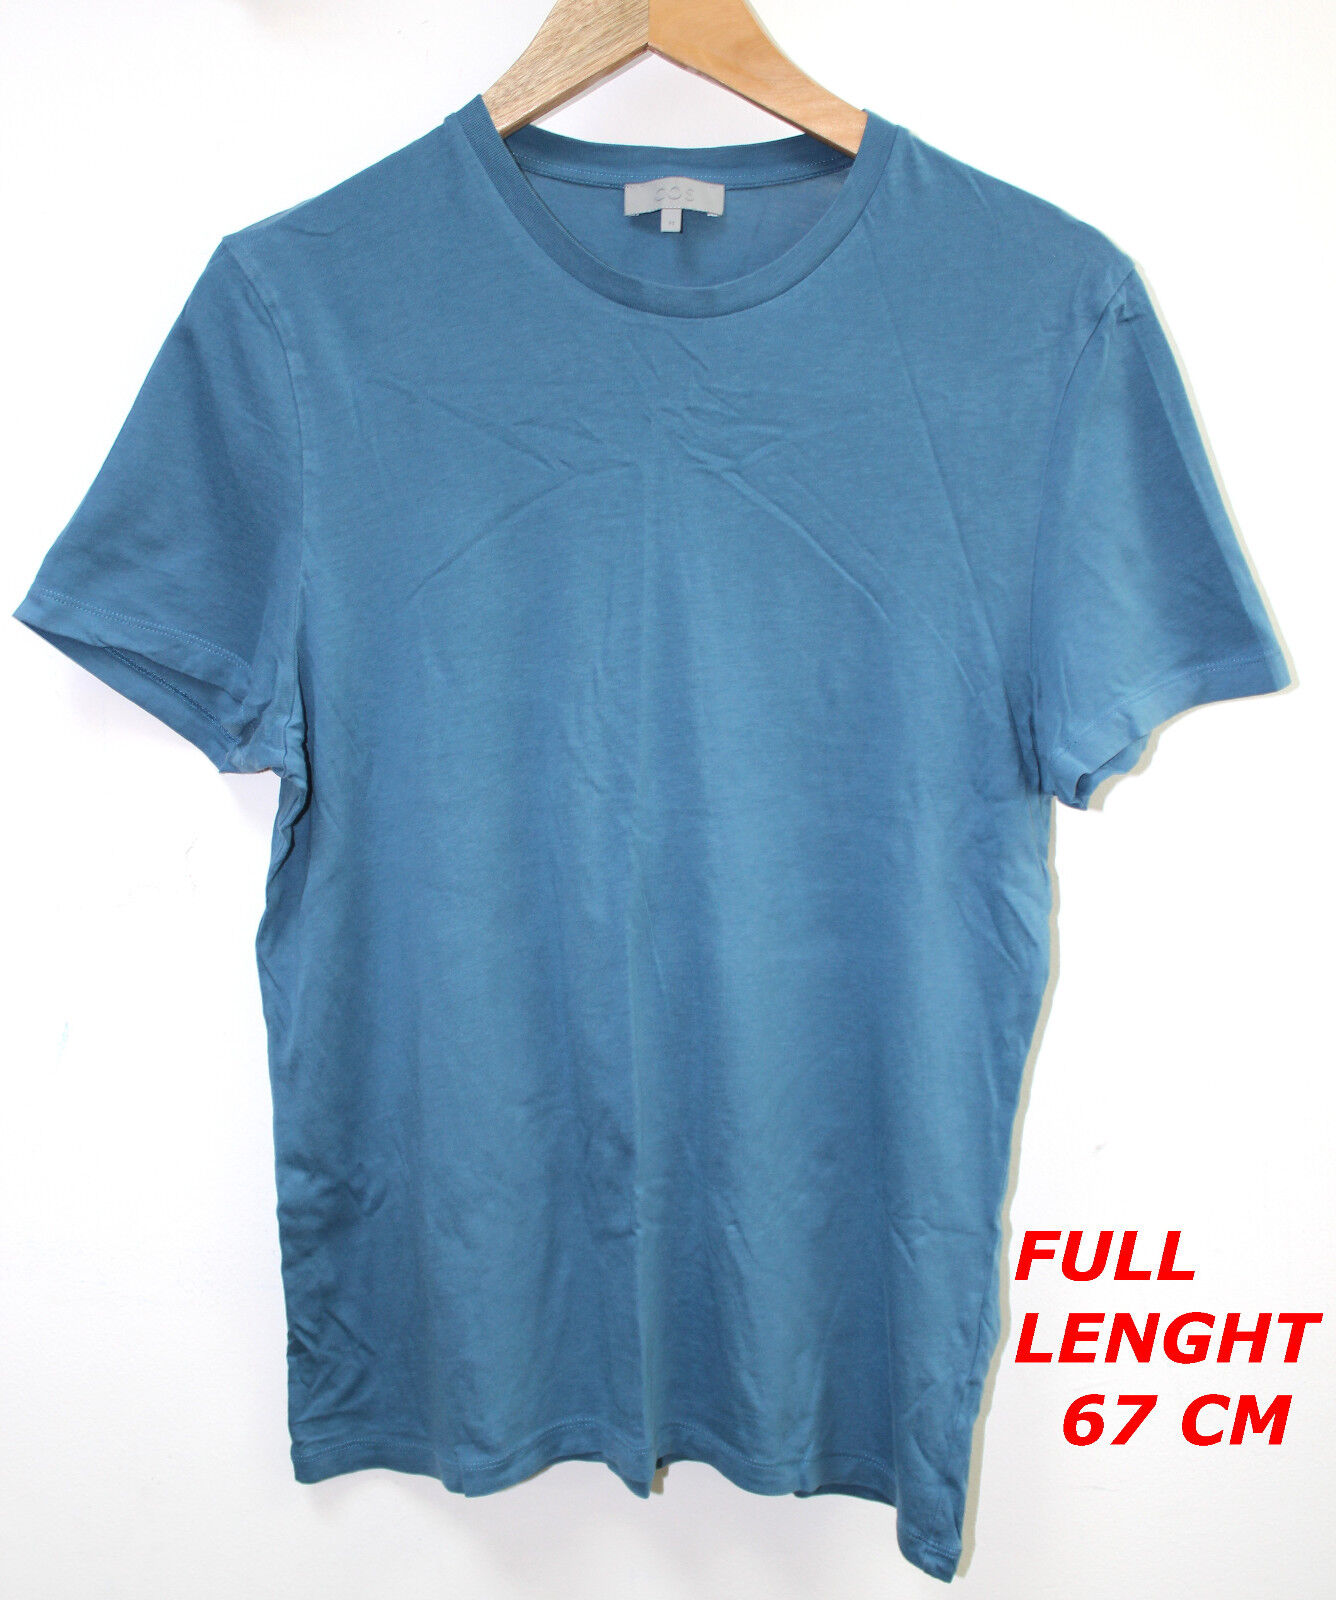 COS Blau Farbe  LADIES WOMAN TOP BLOUSE SHORT SLEEVE MARKED Größe M H 67 CM